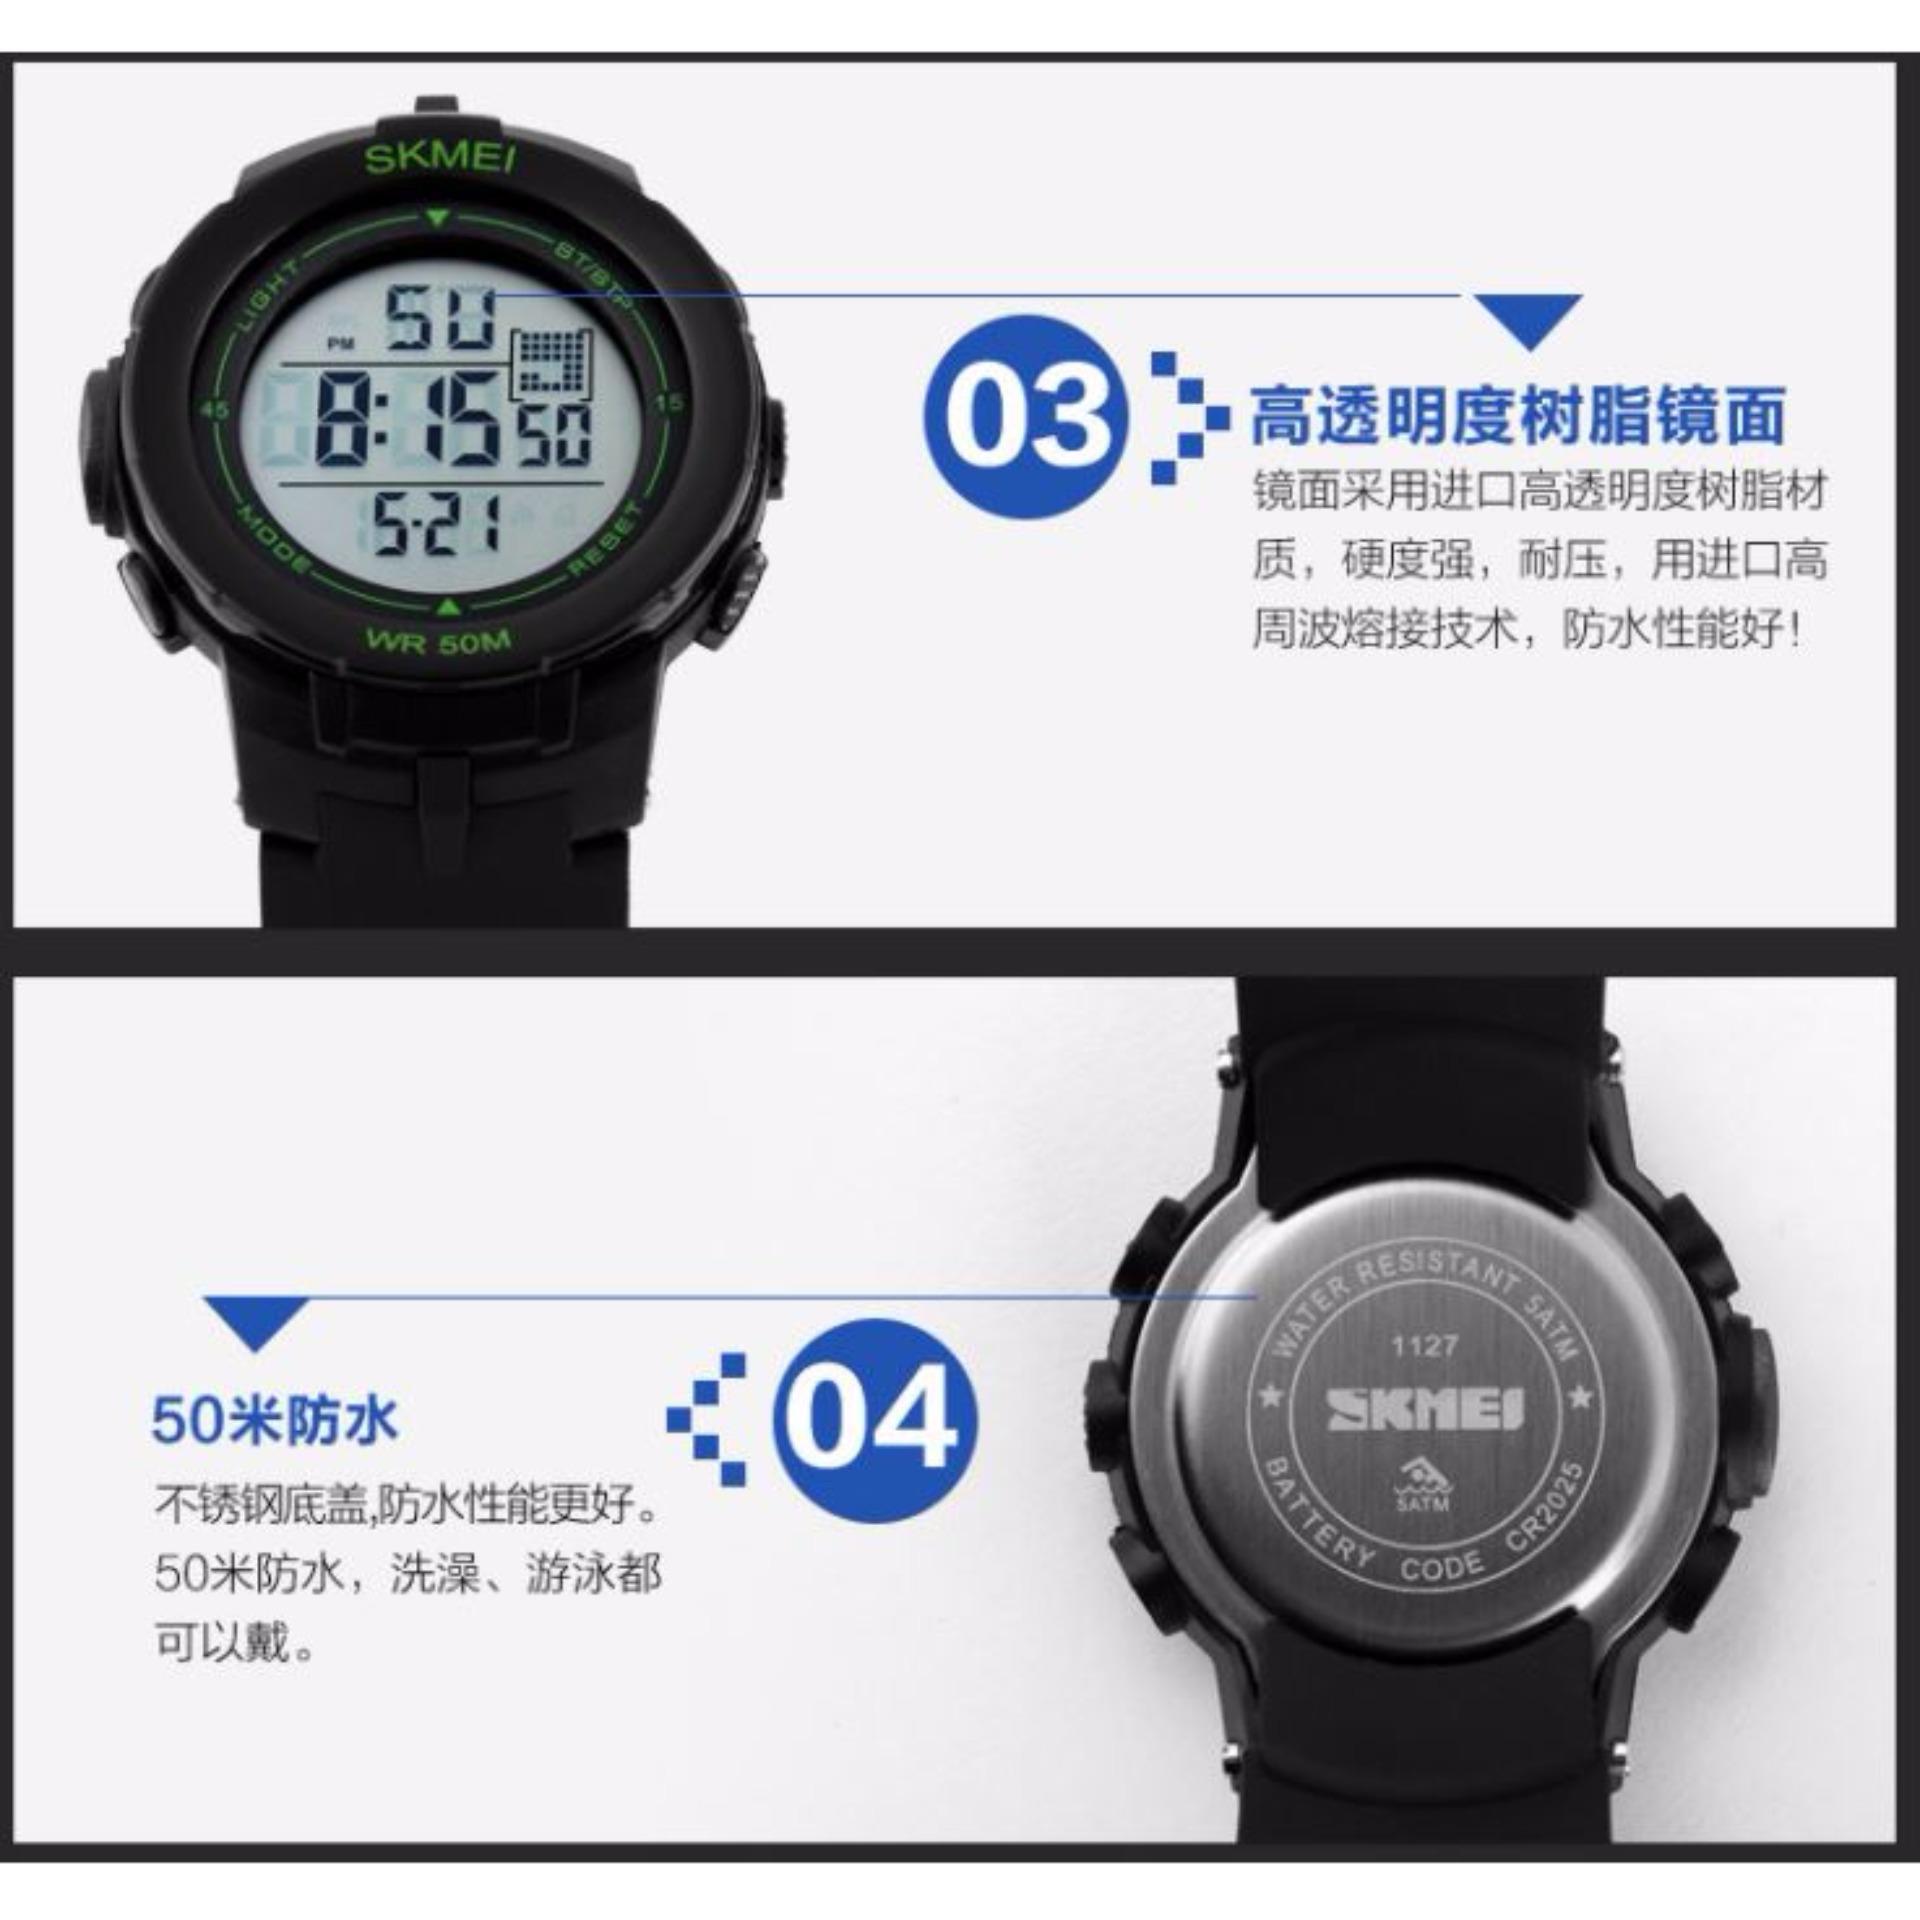 Skmei Trendy Men Sport Led Watch Water Resistant 50m 0814d1 Jam Tangan Pria Casio Ad1109 S Shock 1127 Black